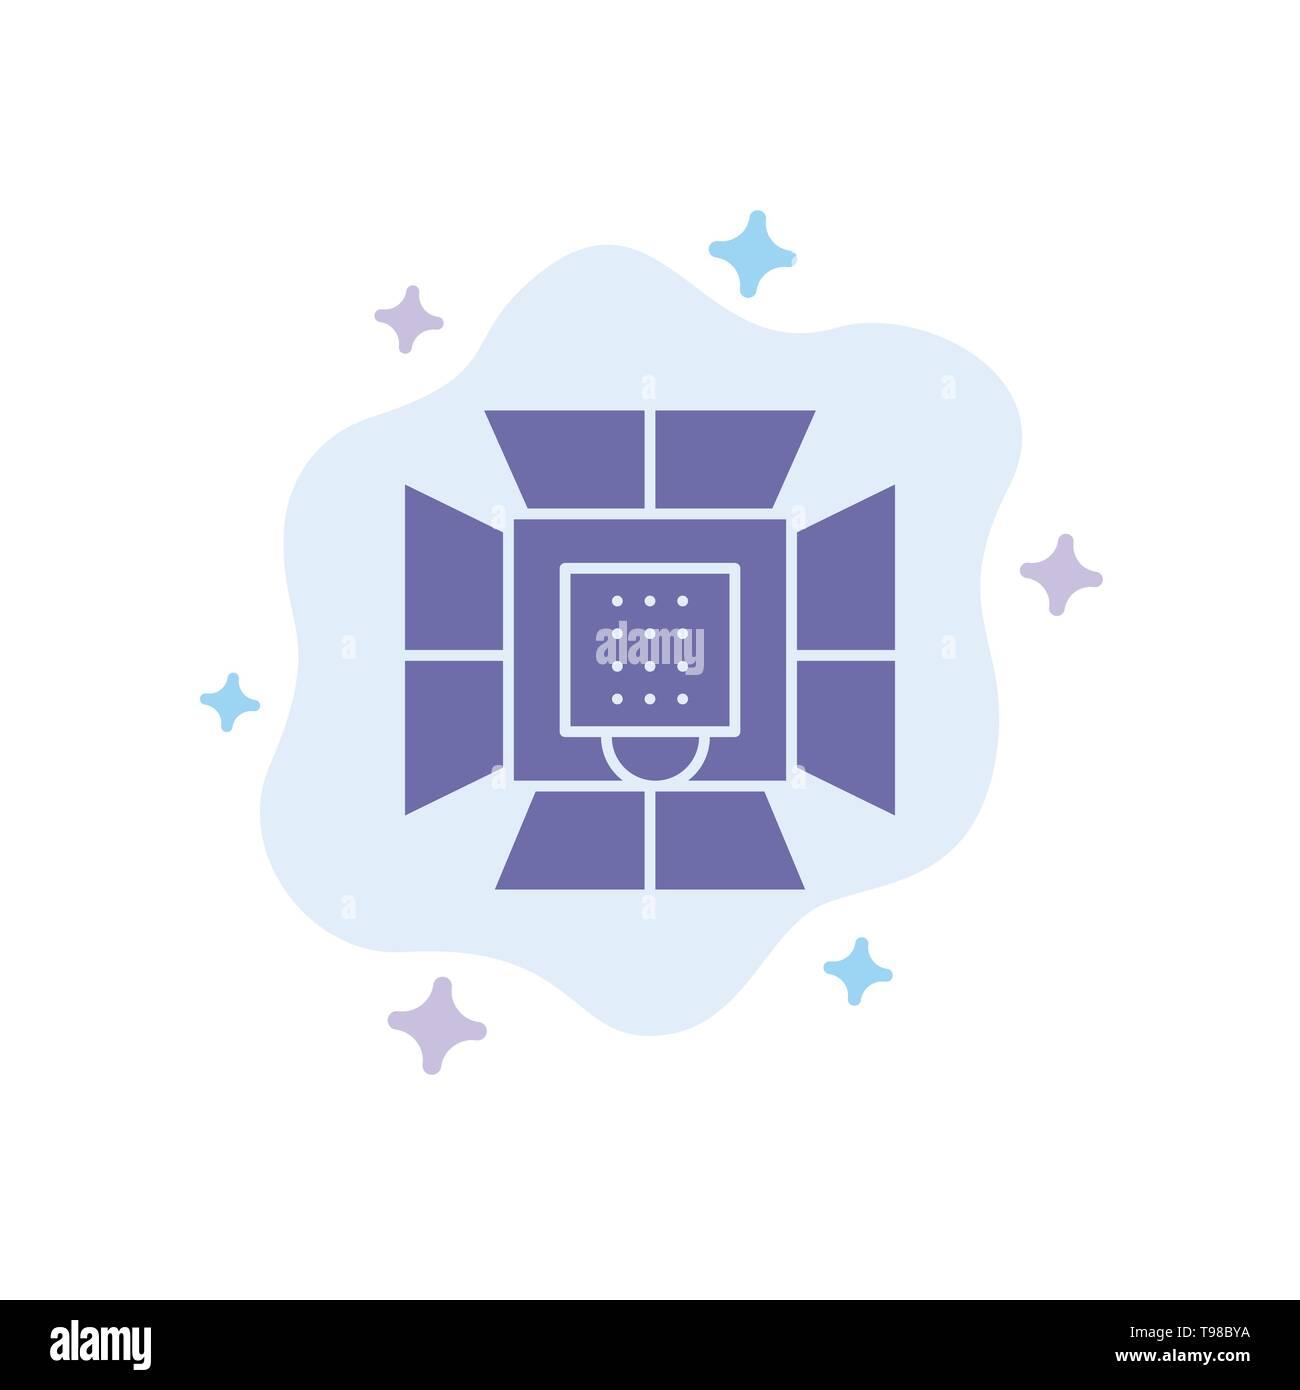 Illumination, Light, Lighting, Professional, Soft box Blue Icon on Abstract Cloud Background - Stock Image